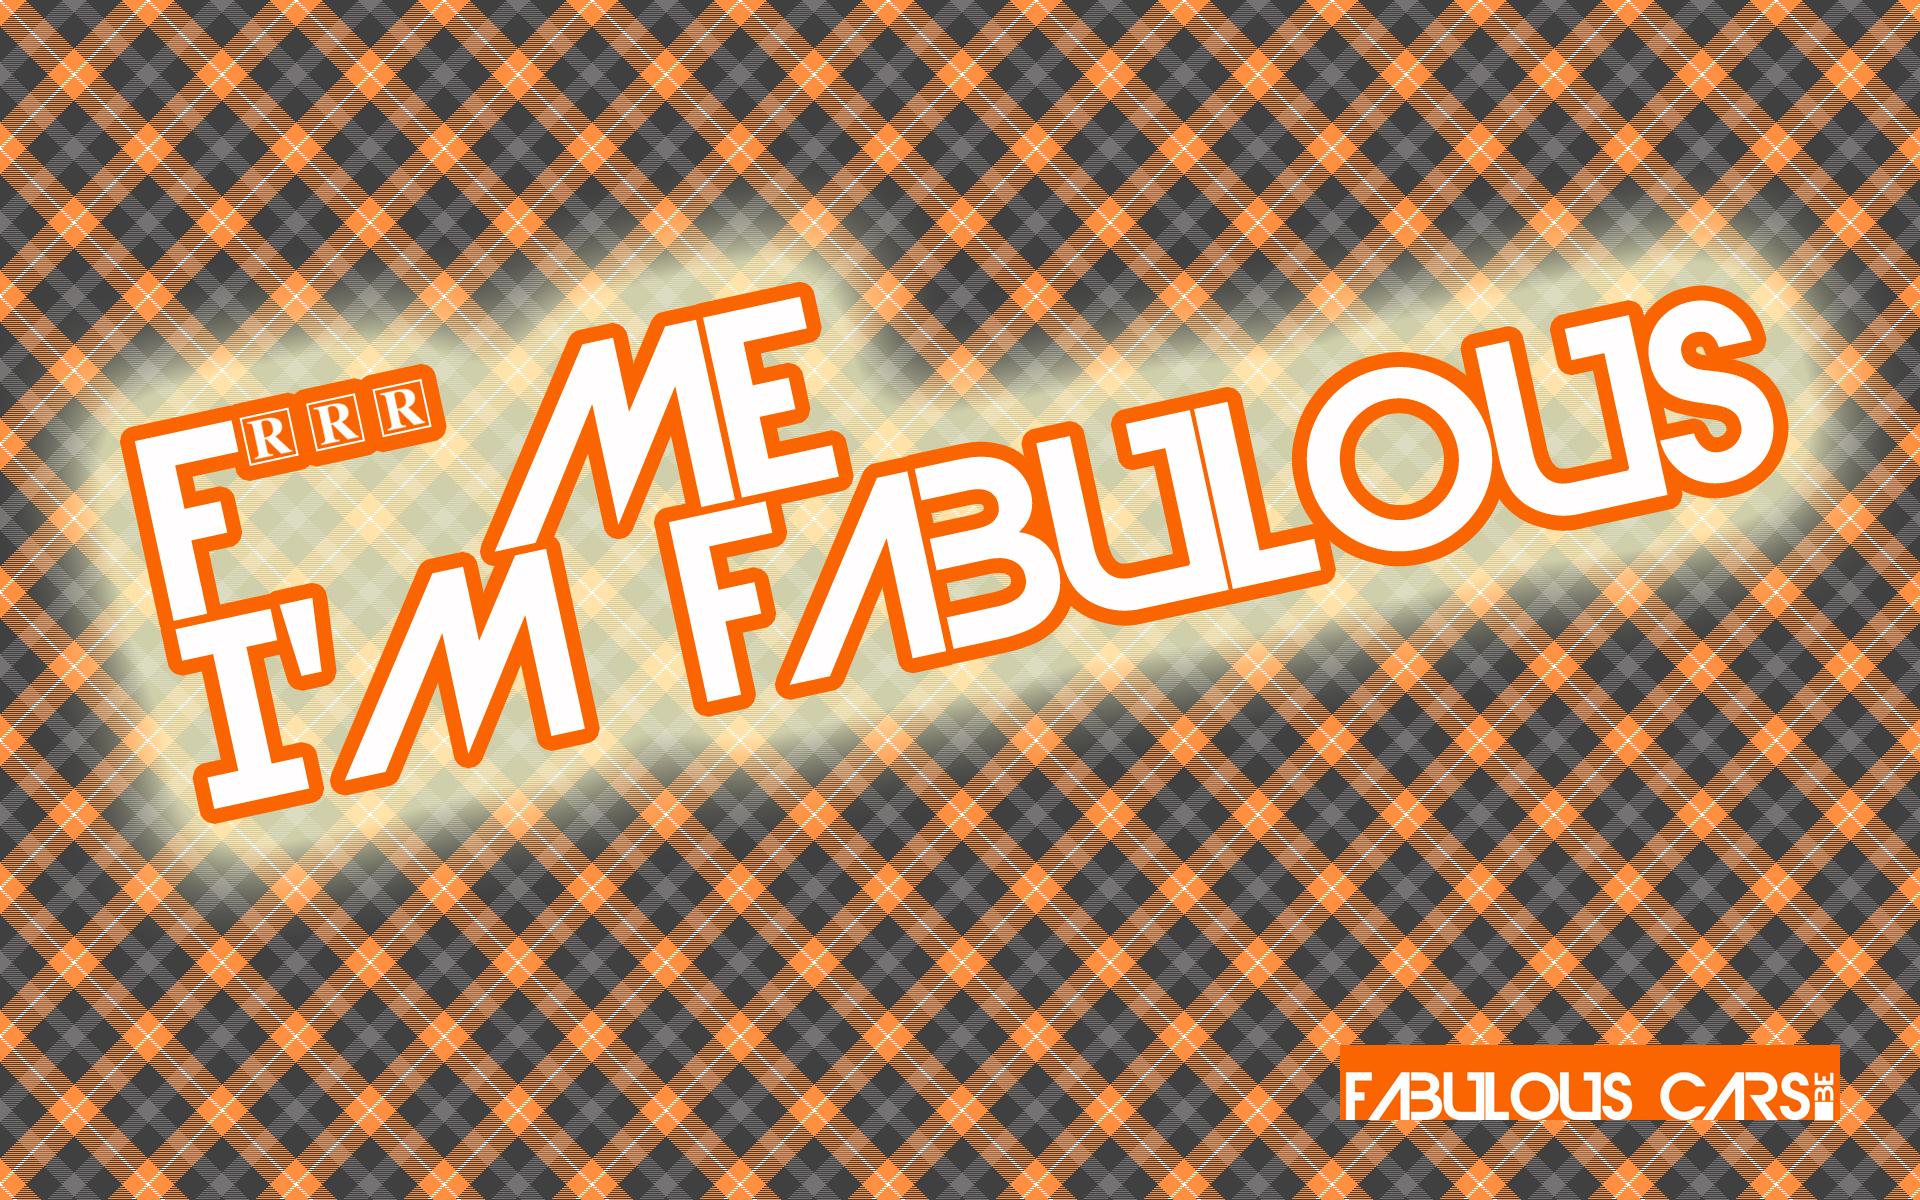 Me Im Fabulous Wallpaper Fabulous Carsbe 1920x1200